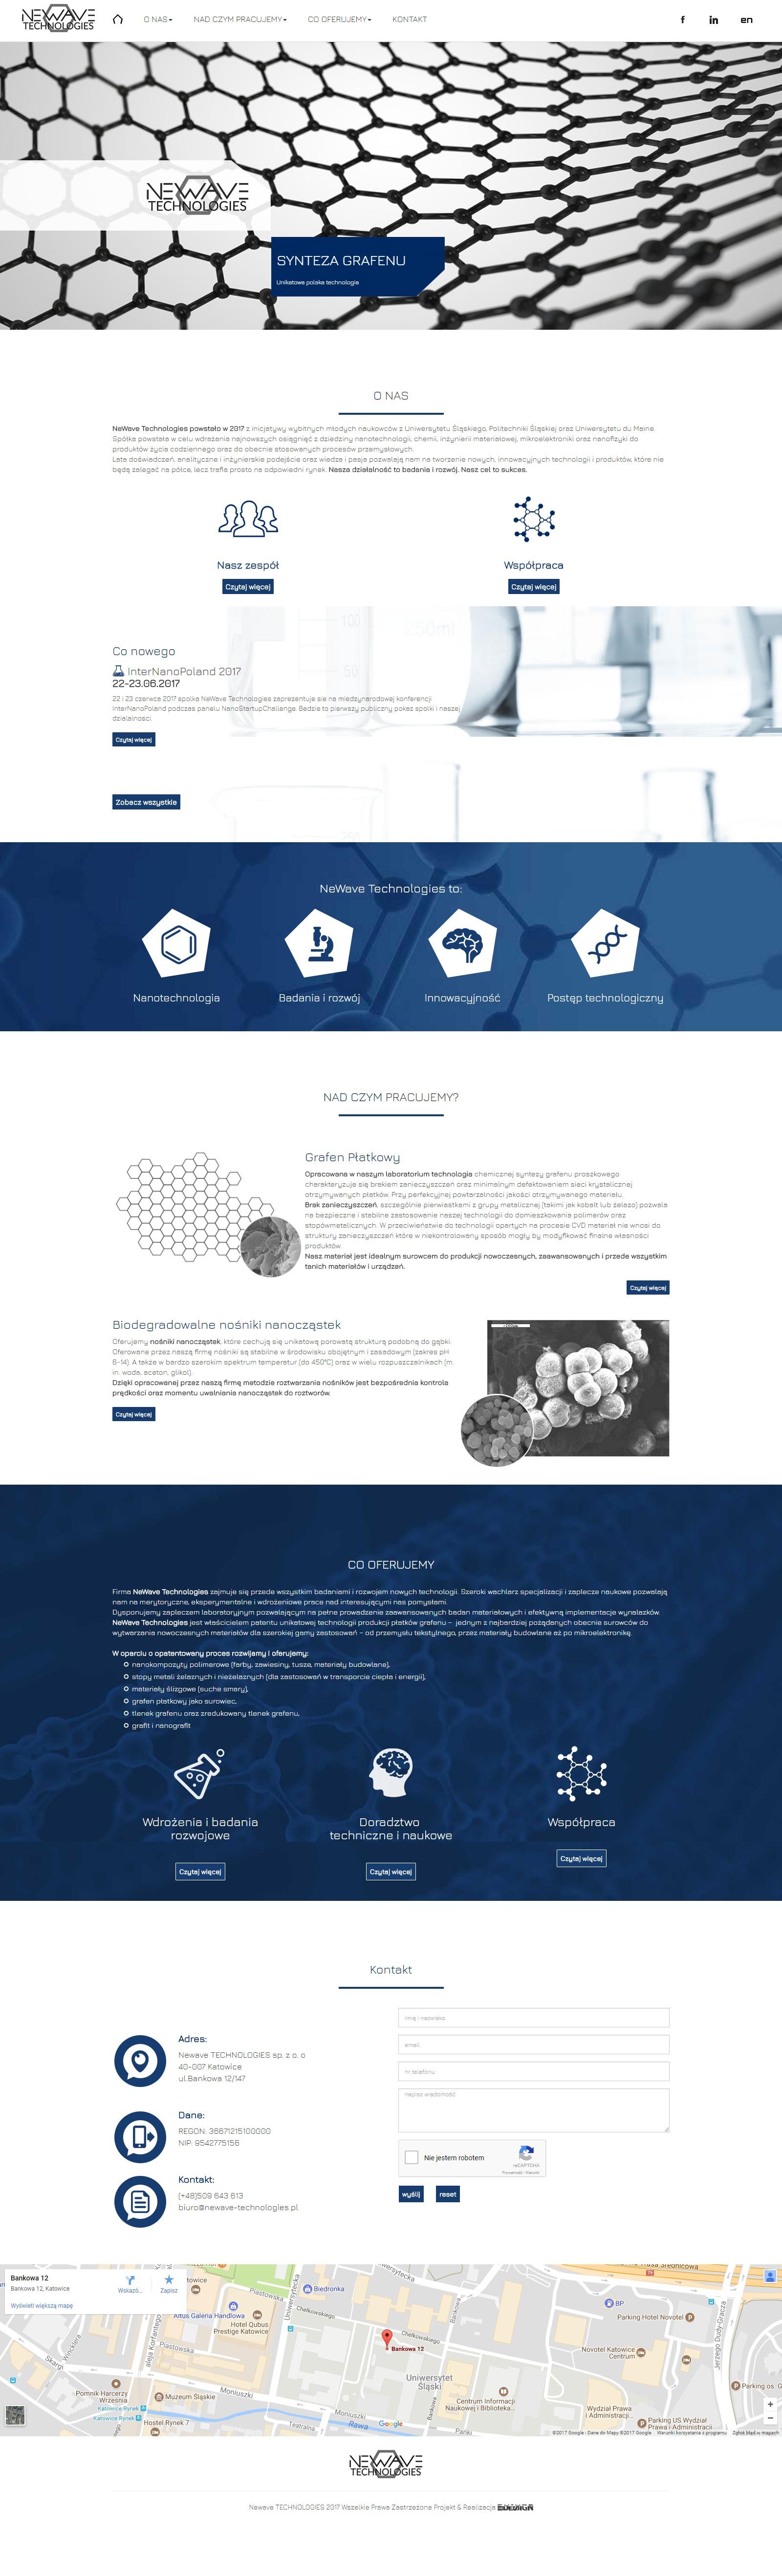 Newave technologies 1